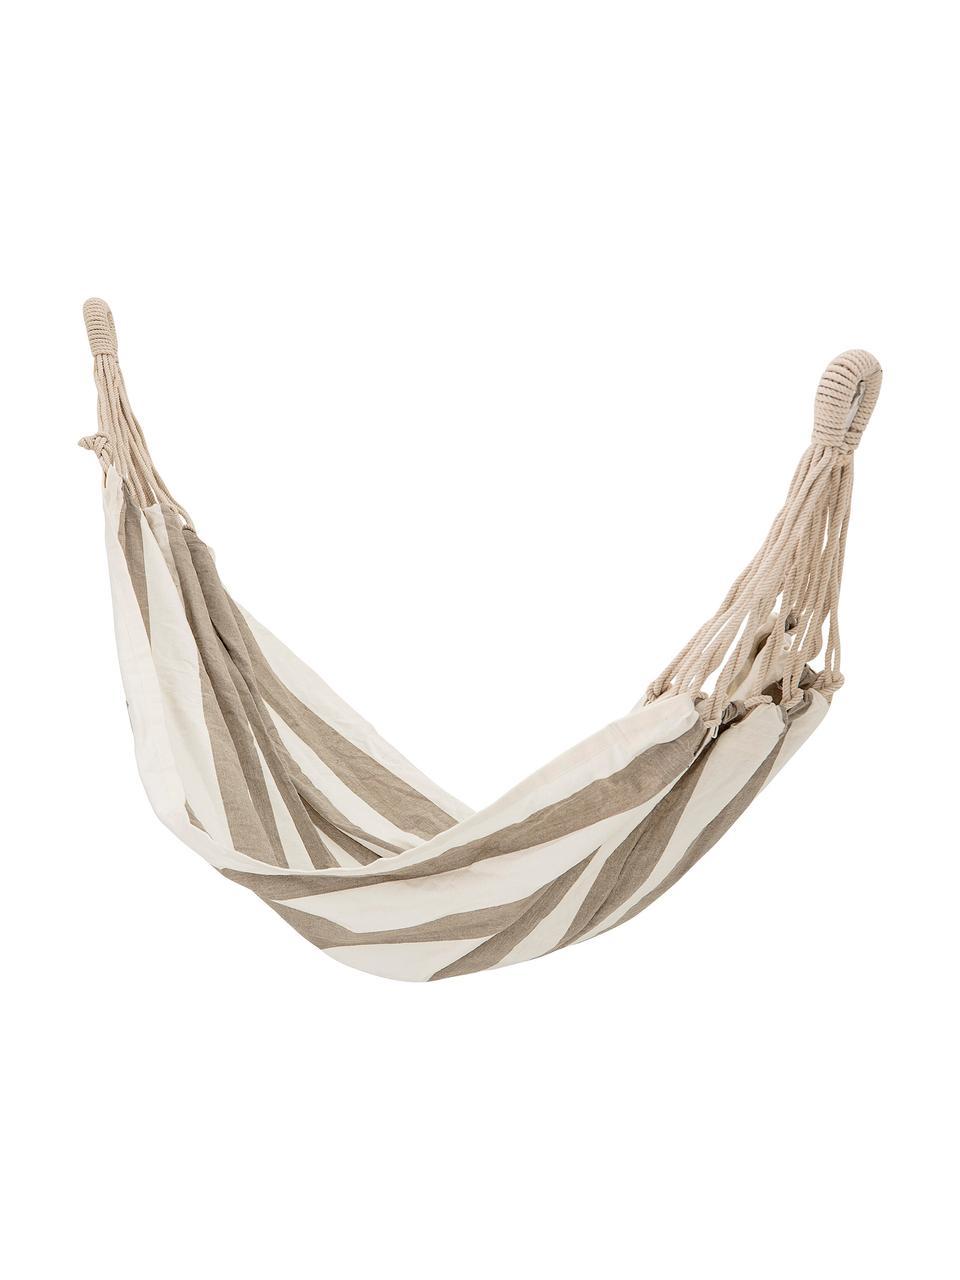 Amaca in cotone con motivo a righe Lazy, Cotone, Bianco, beige, Larg. 100 x Lung. 270 cm